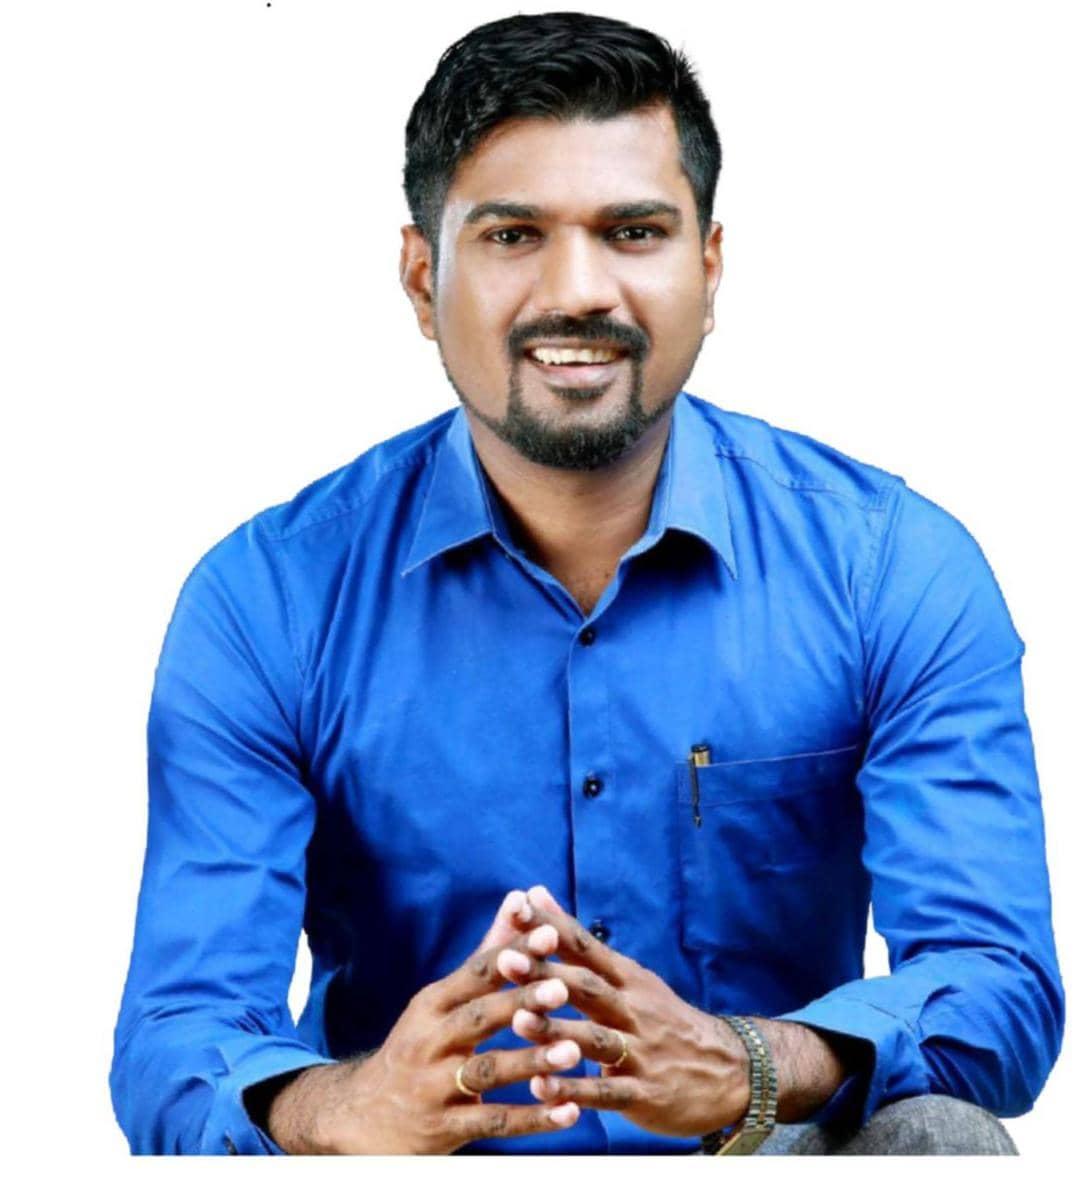 Jobin S Kottaram Moulding dreams and transforming lives